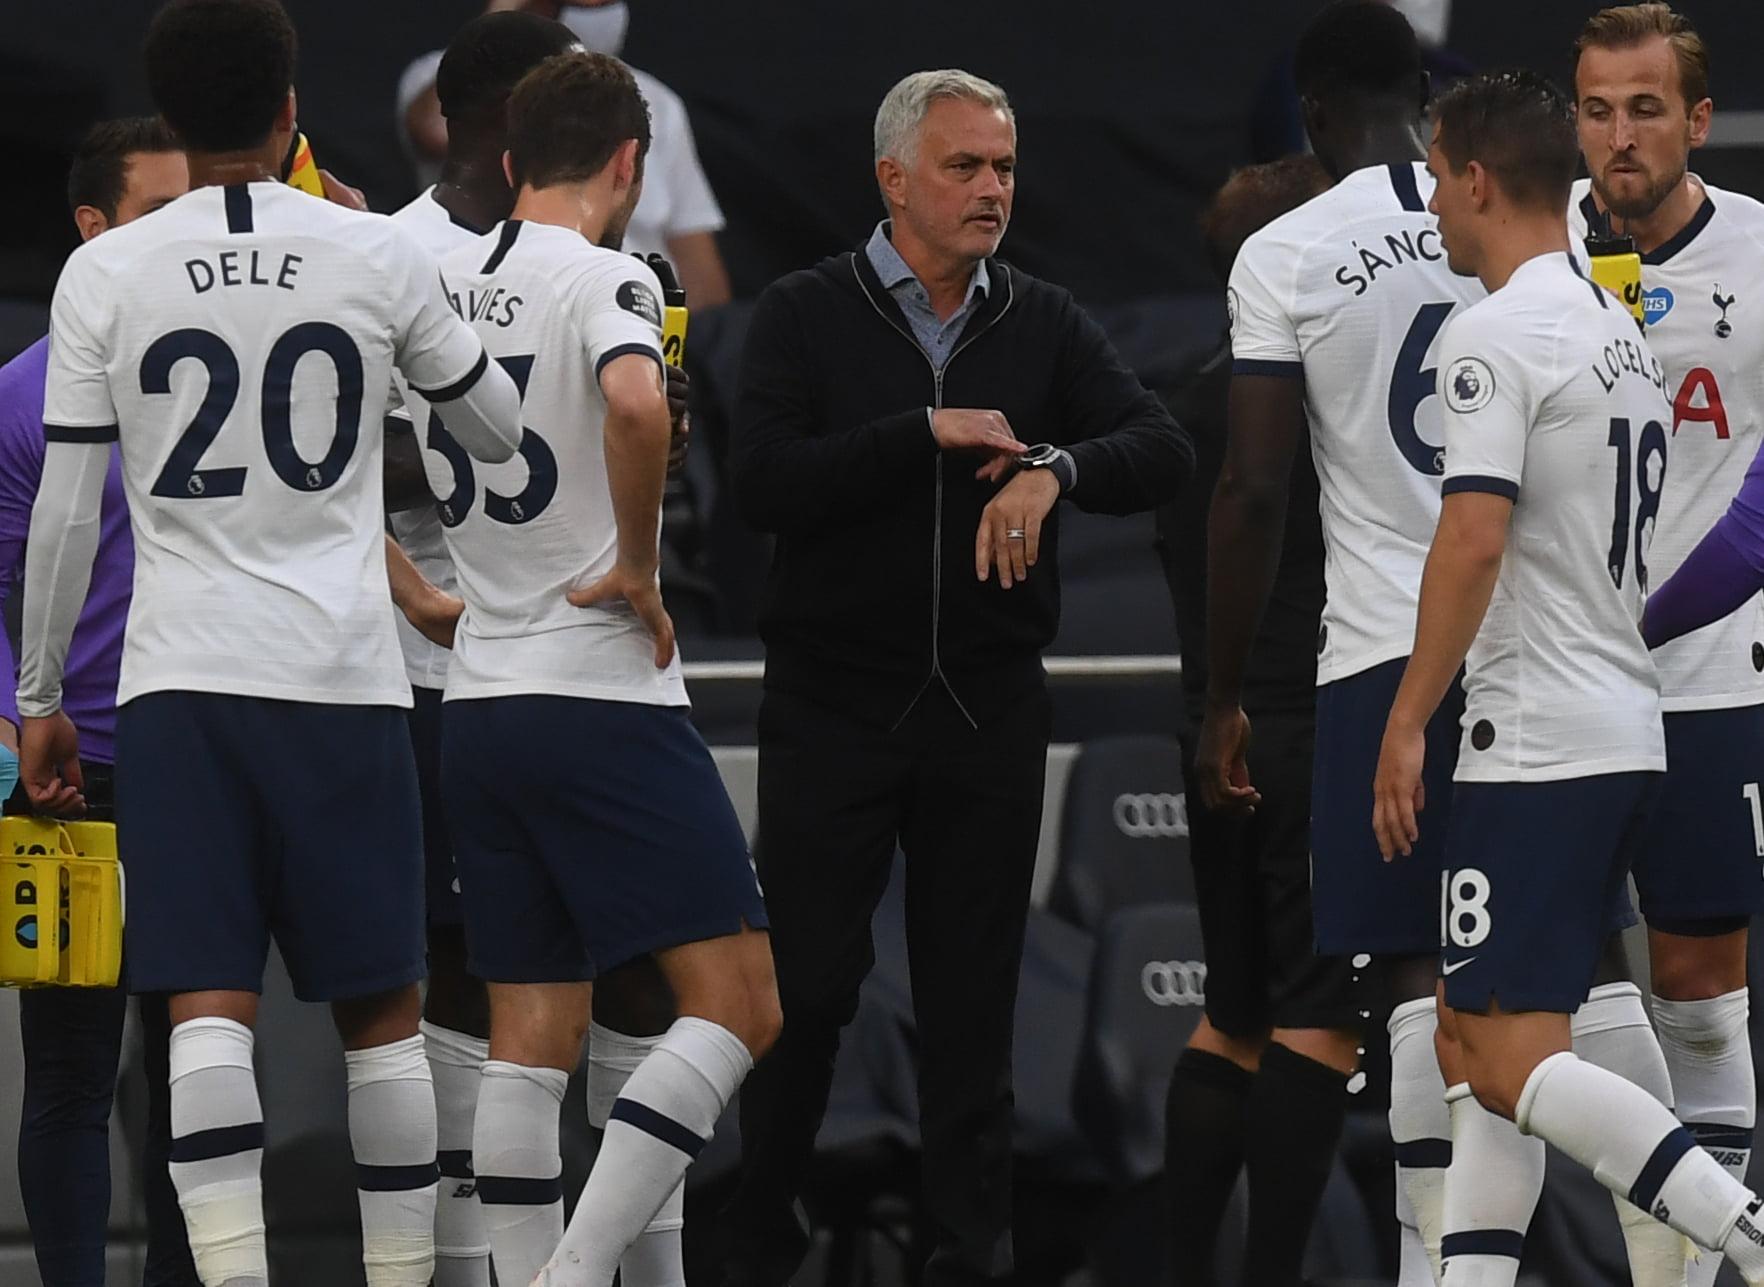 4-2-3-1 Tottenham Hotspur predicted lineup vs Sheffield United (Tottenham players seen taking a drinks break in the photo)